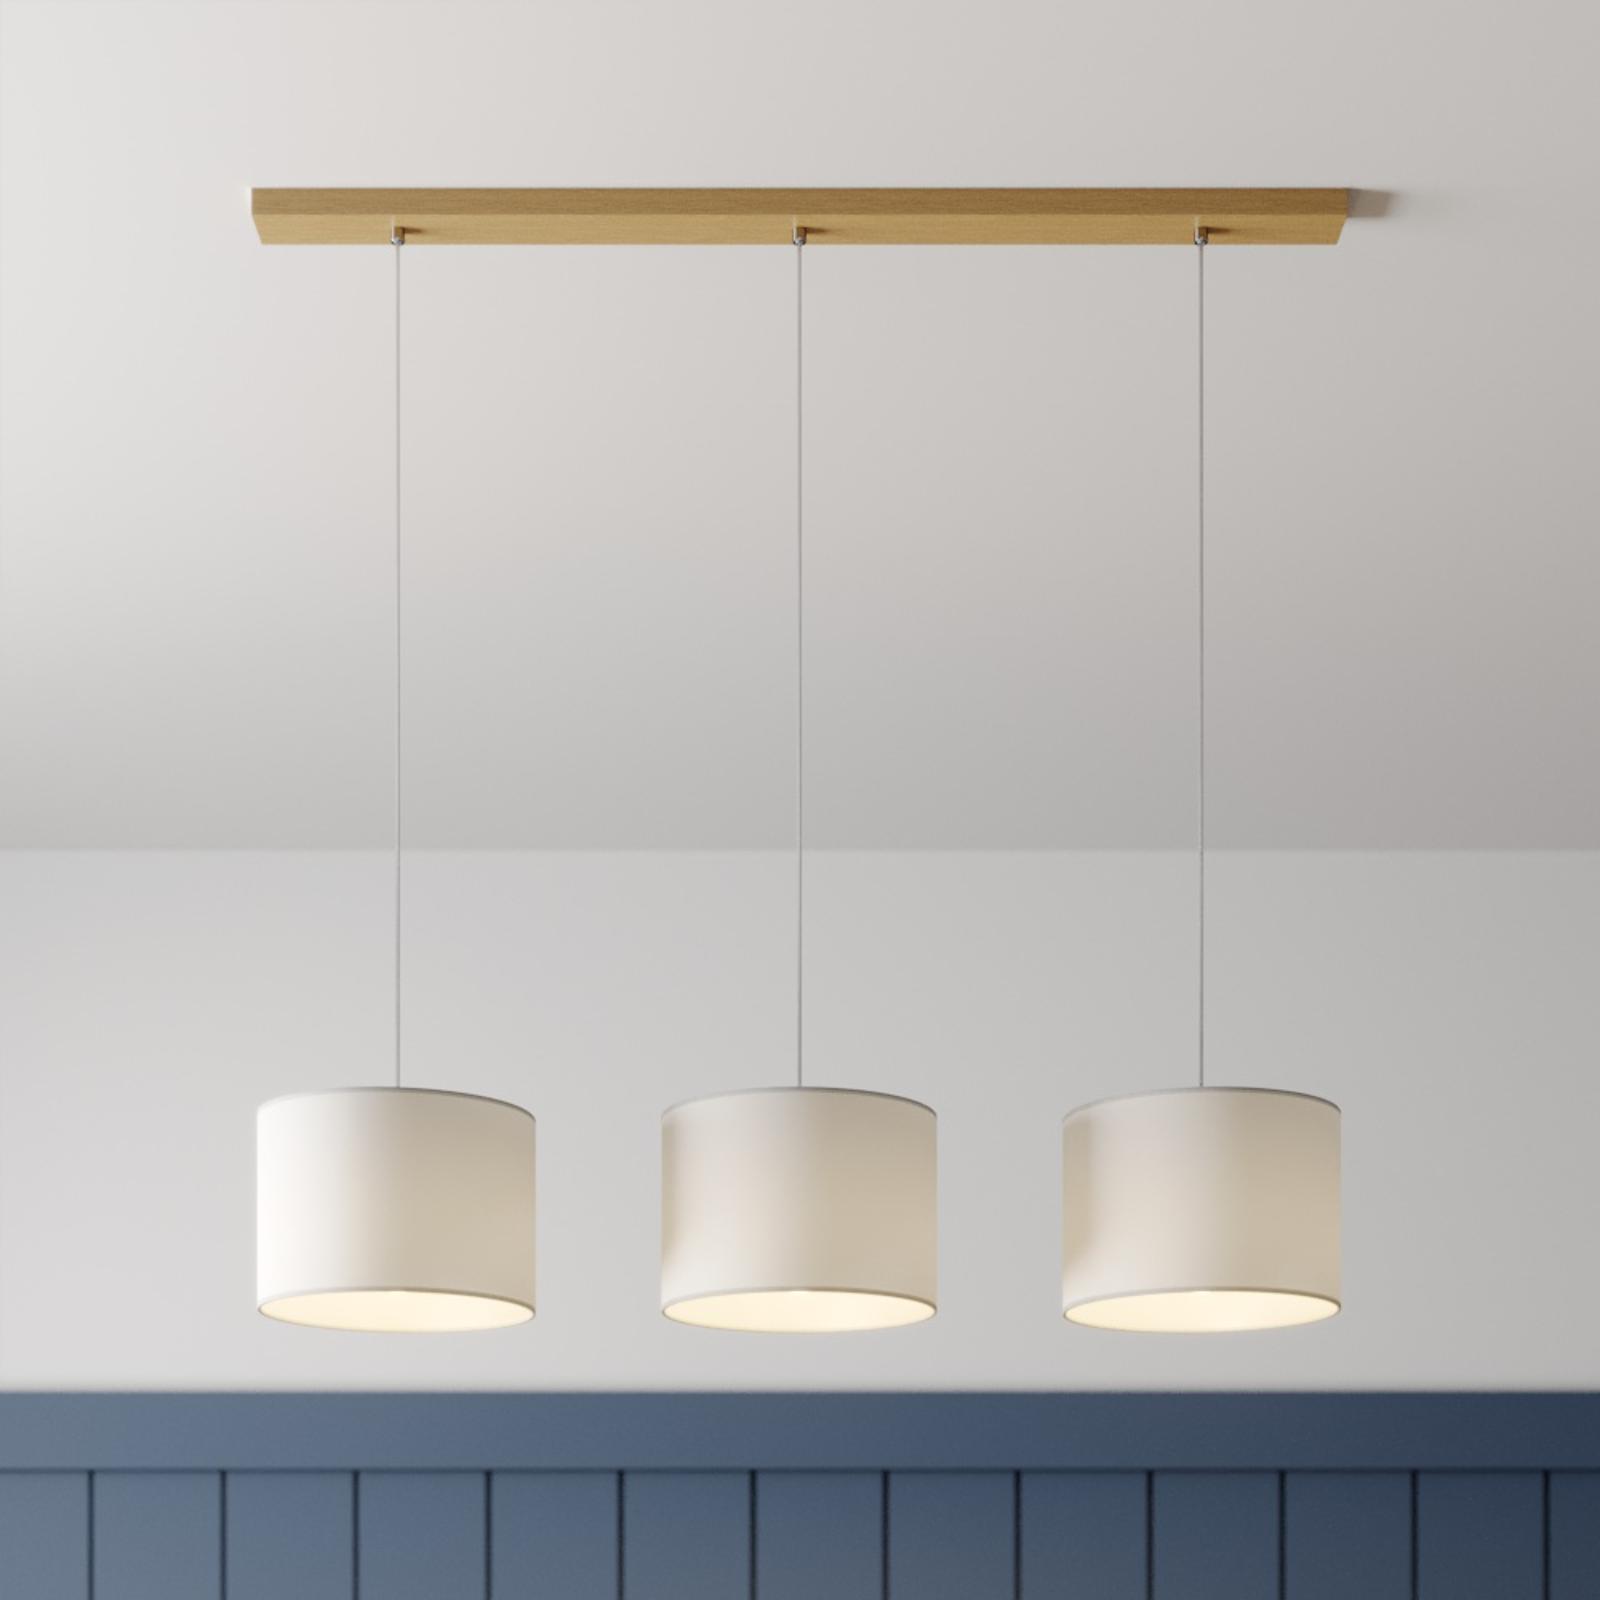 Lampa wisząca Corralee, biała, 3-punktowa